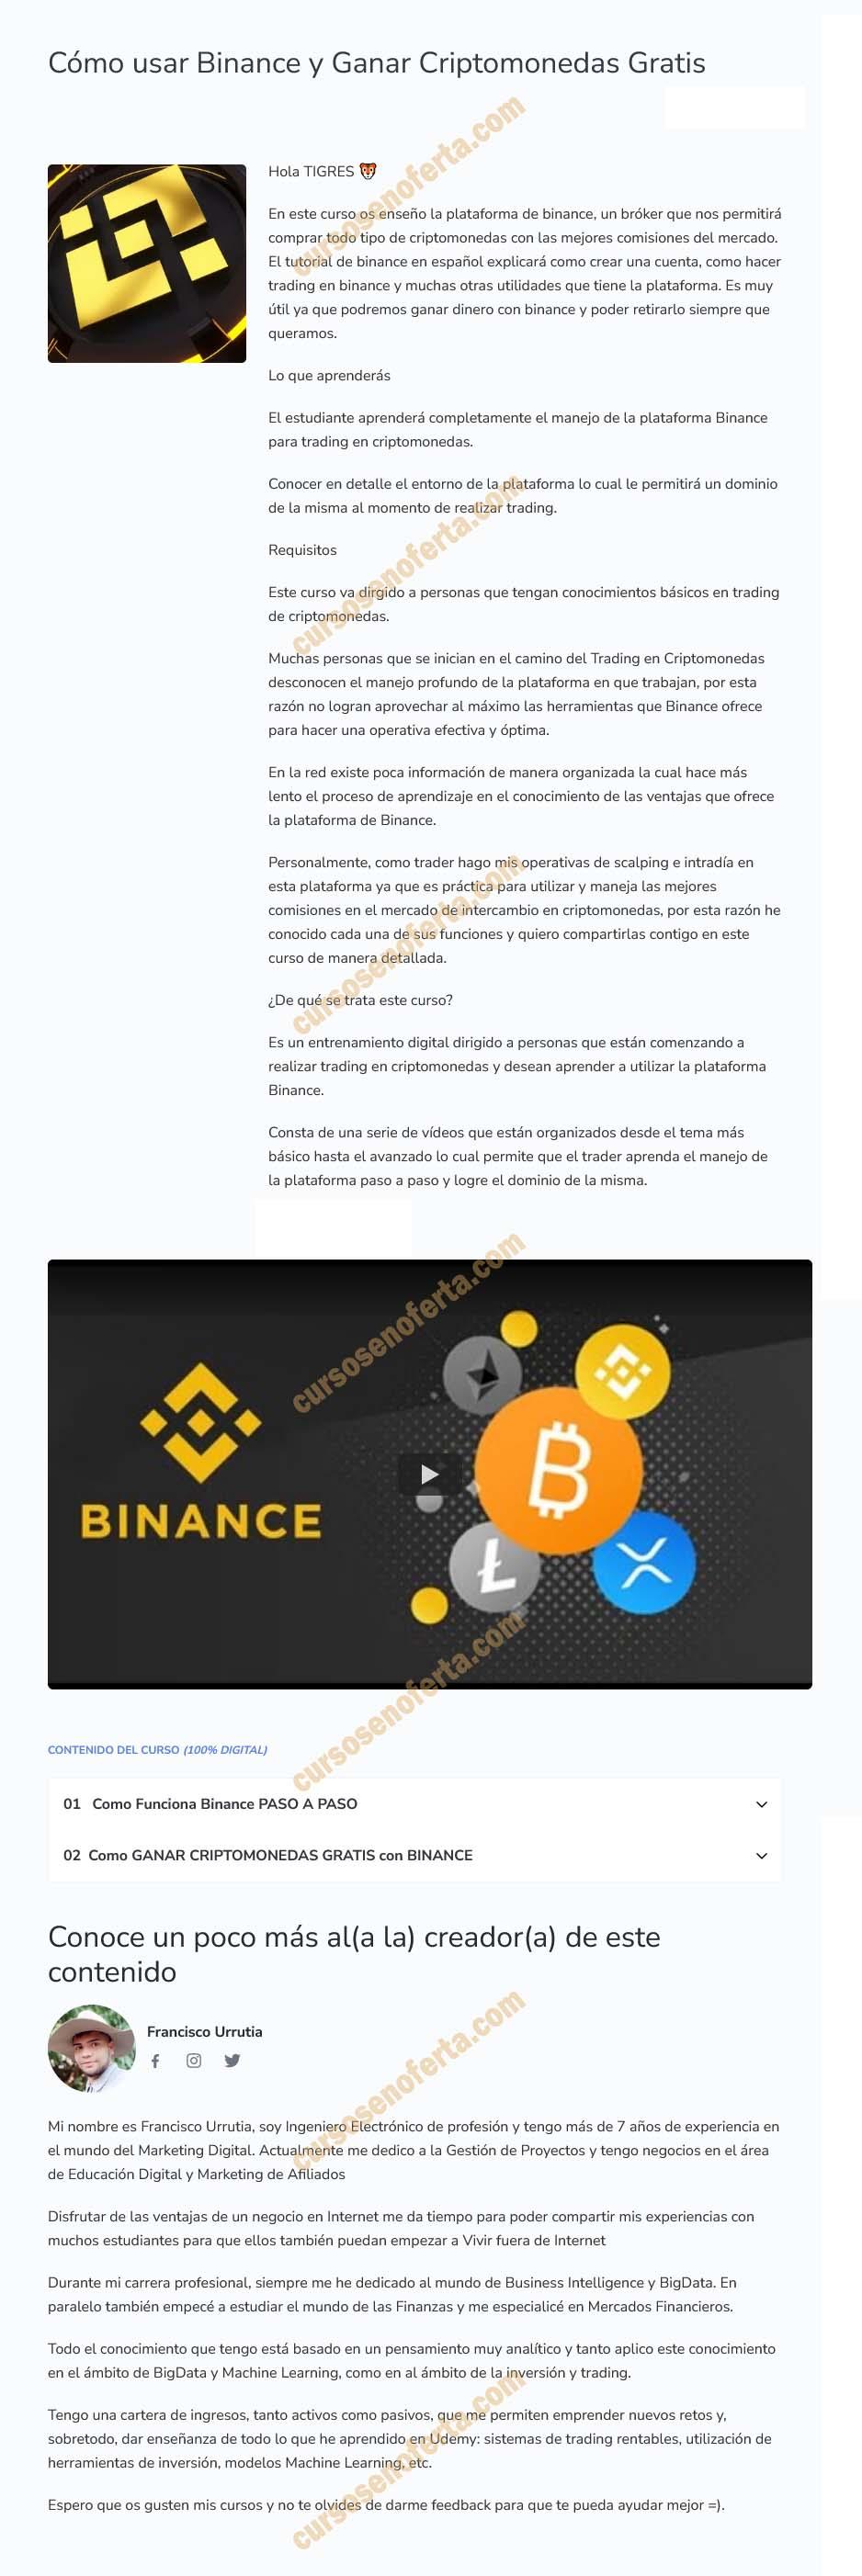 https://www.hotmart.com/product/es/como-usar-binance-y-ganar-criptomonedas-gratis/L58592040P